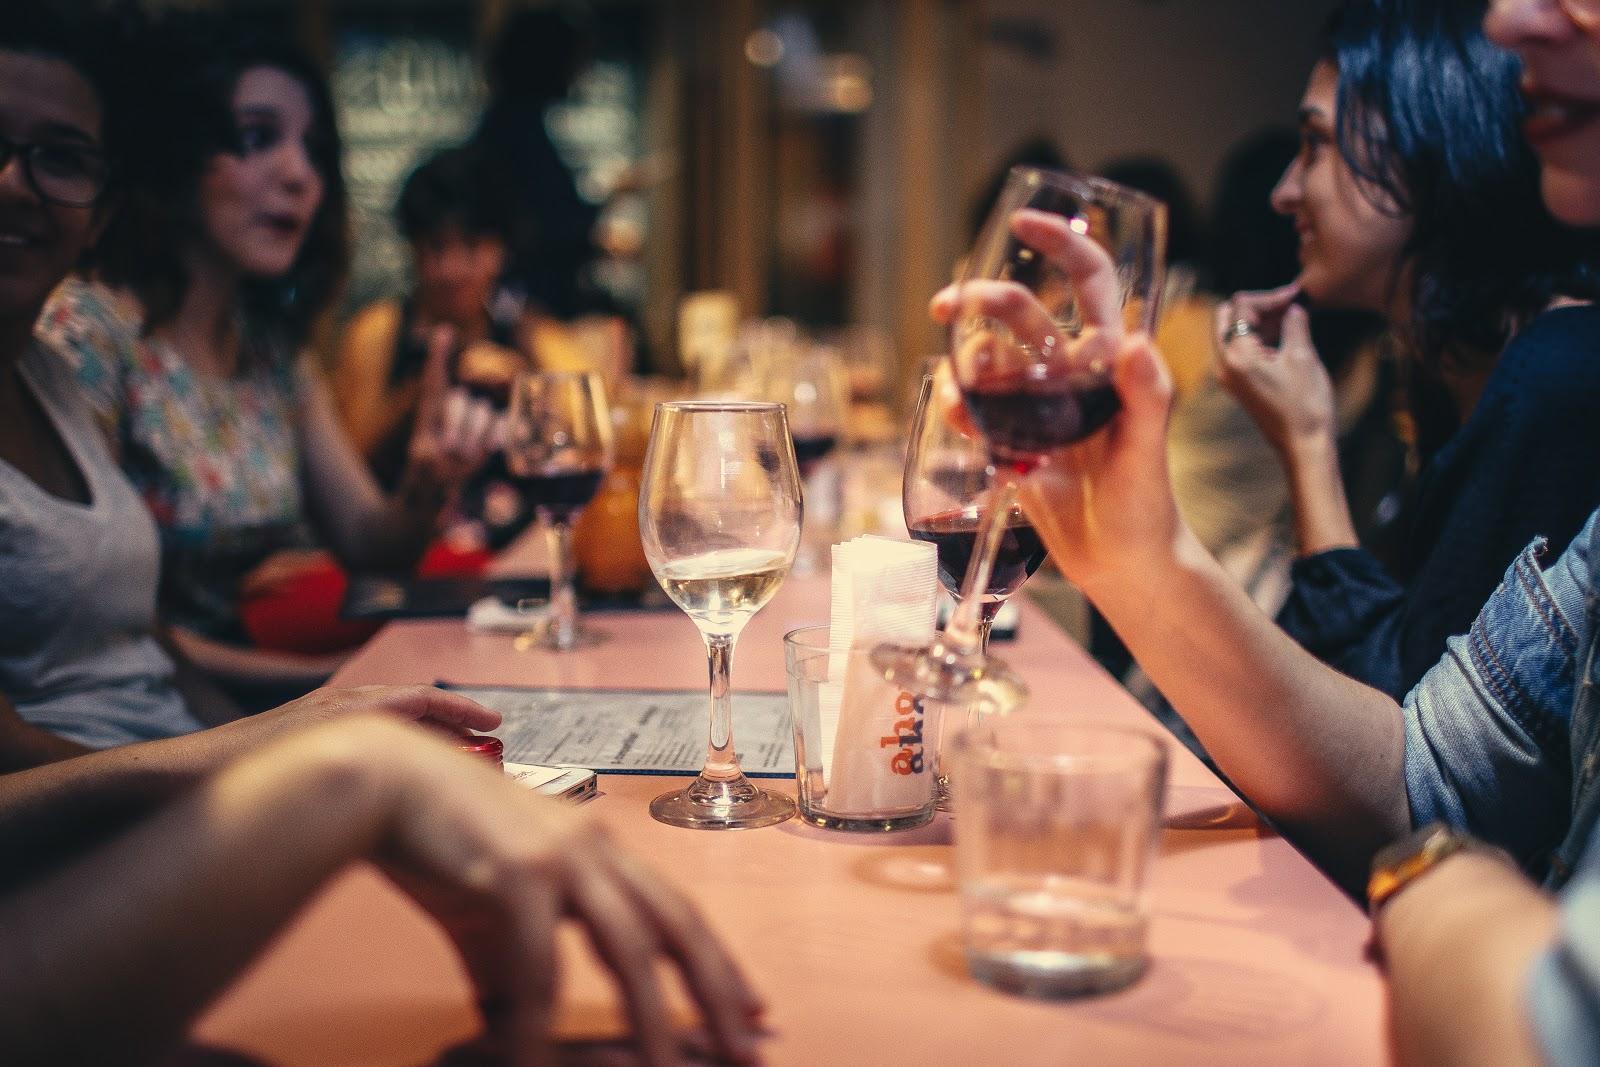 people eating & drinking